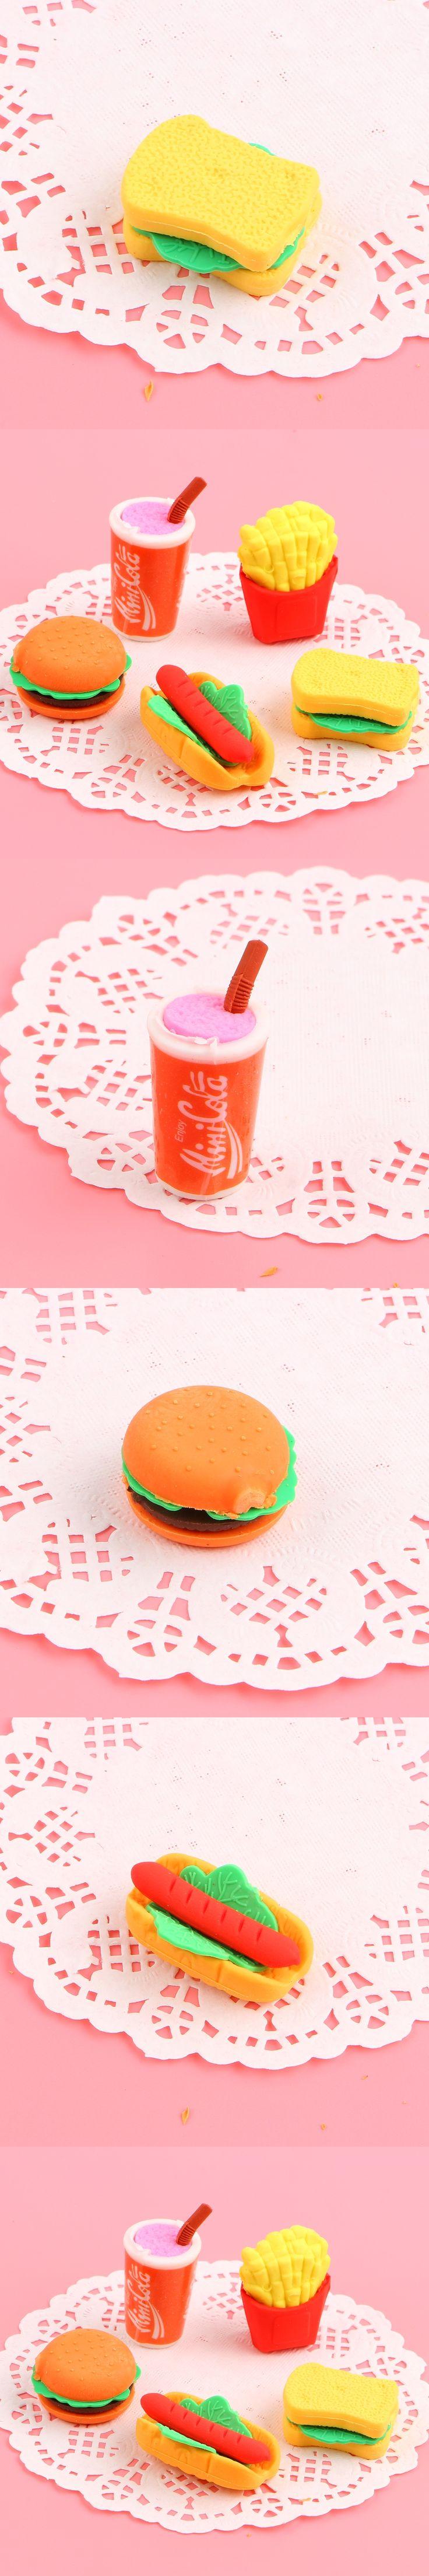 1 pcs Food eraser set for kid's love school eraser kawaii pencil eraser stationery School Supplies free shipping